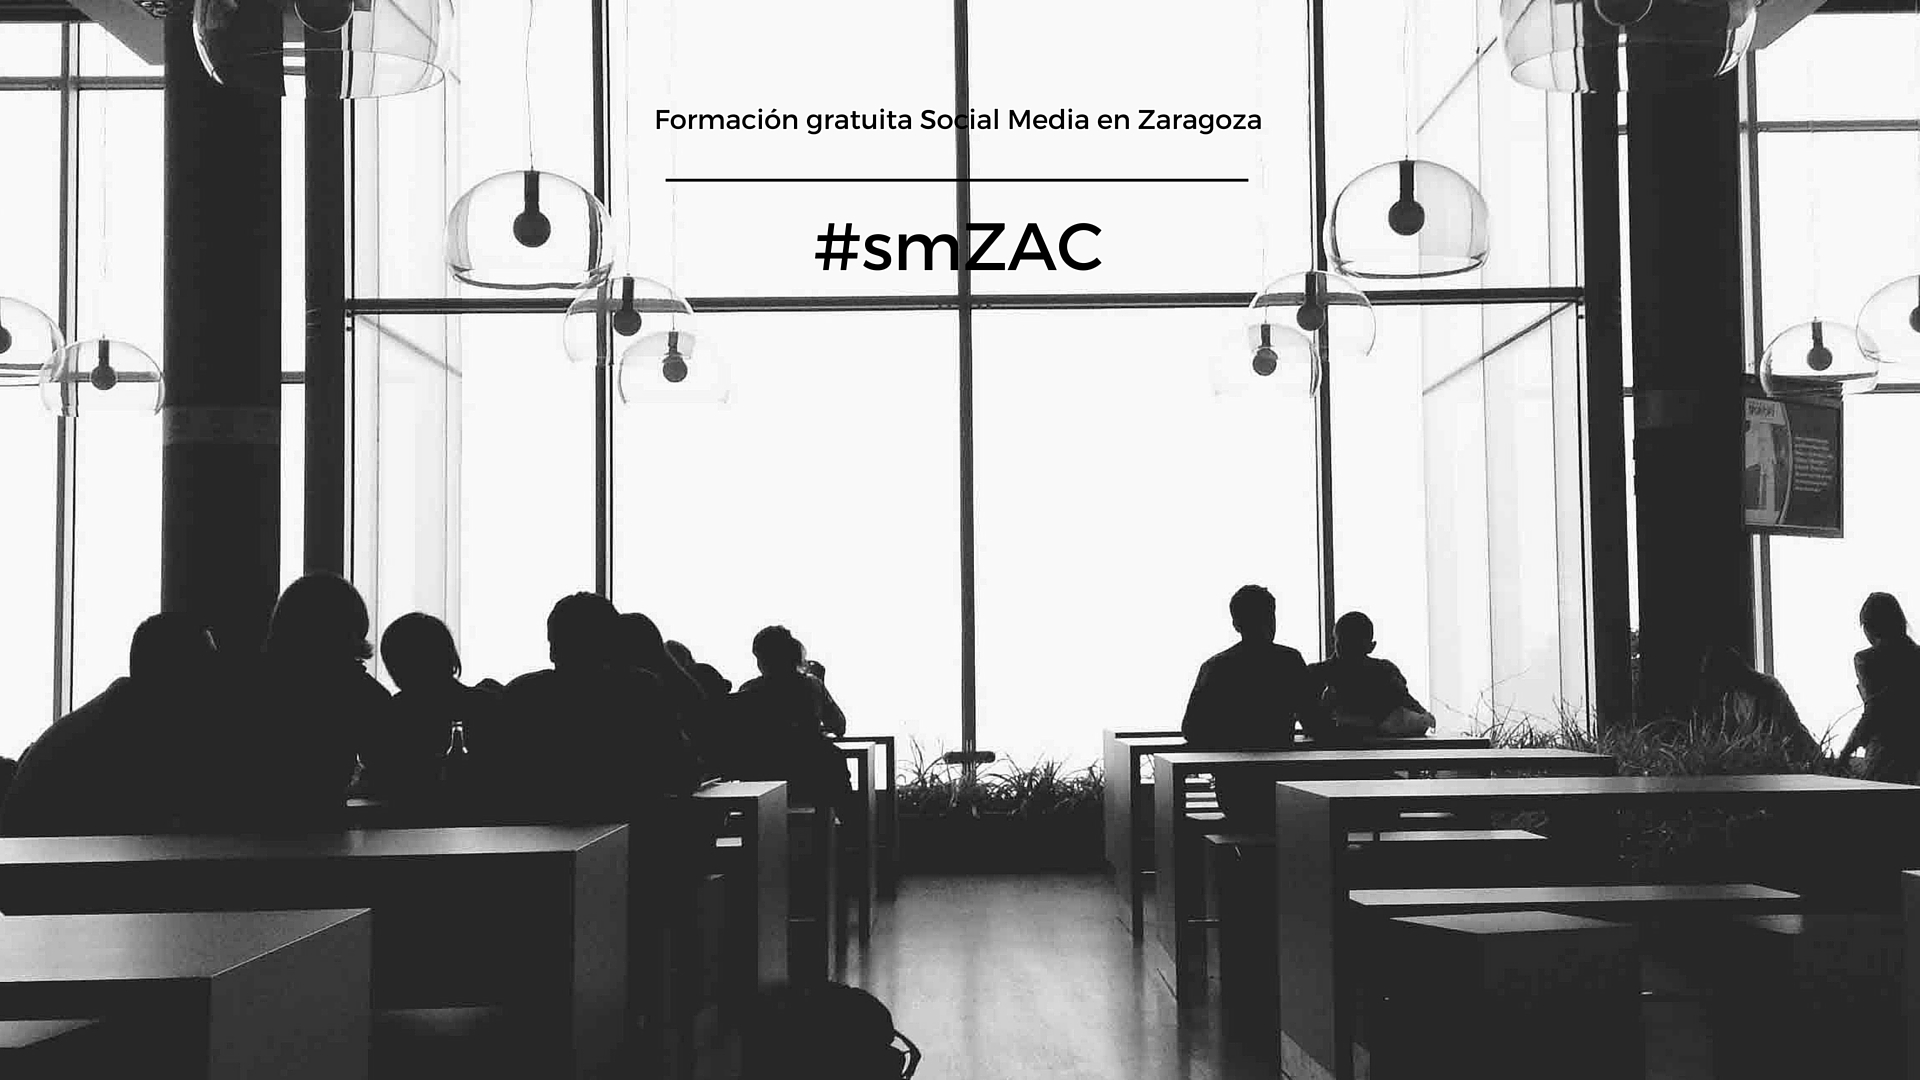 smZAC: formación gratuita Social Media en Zaragoza